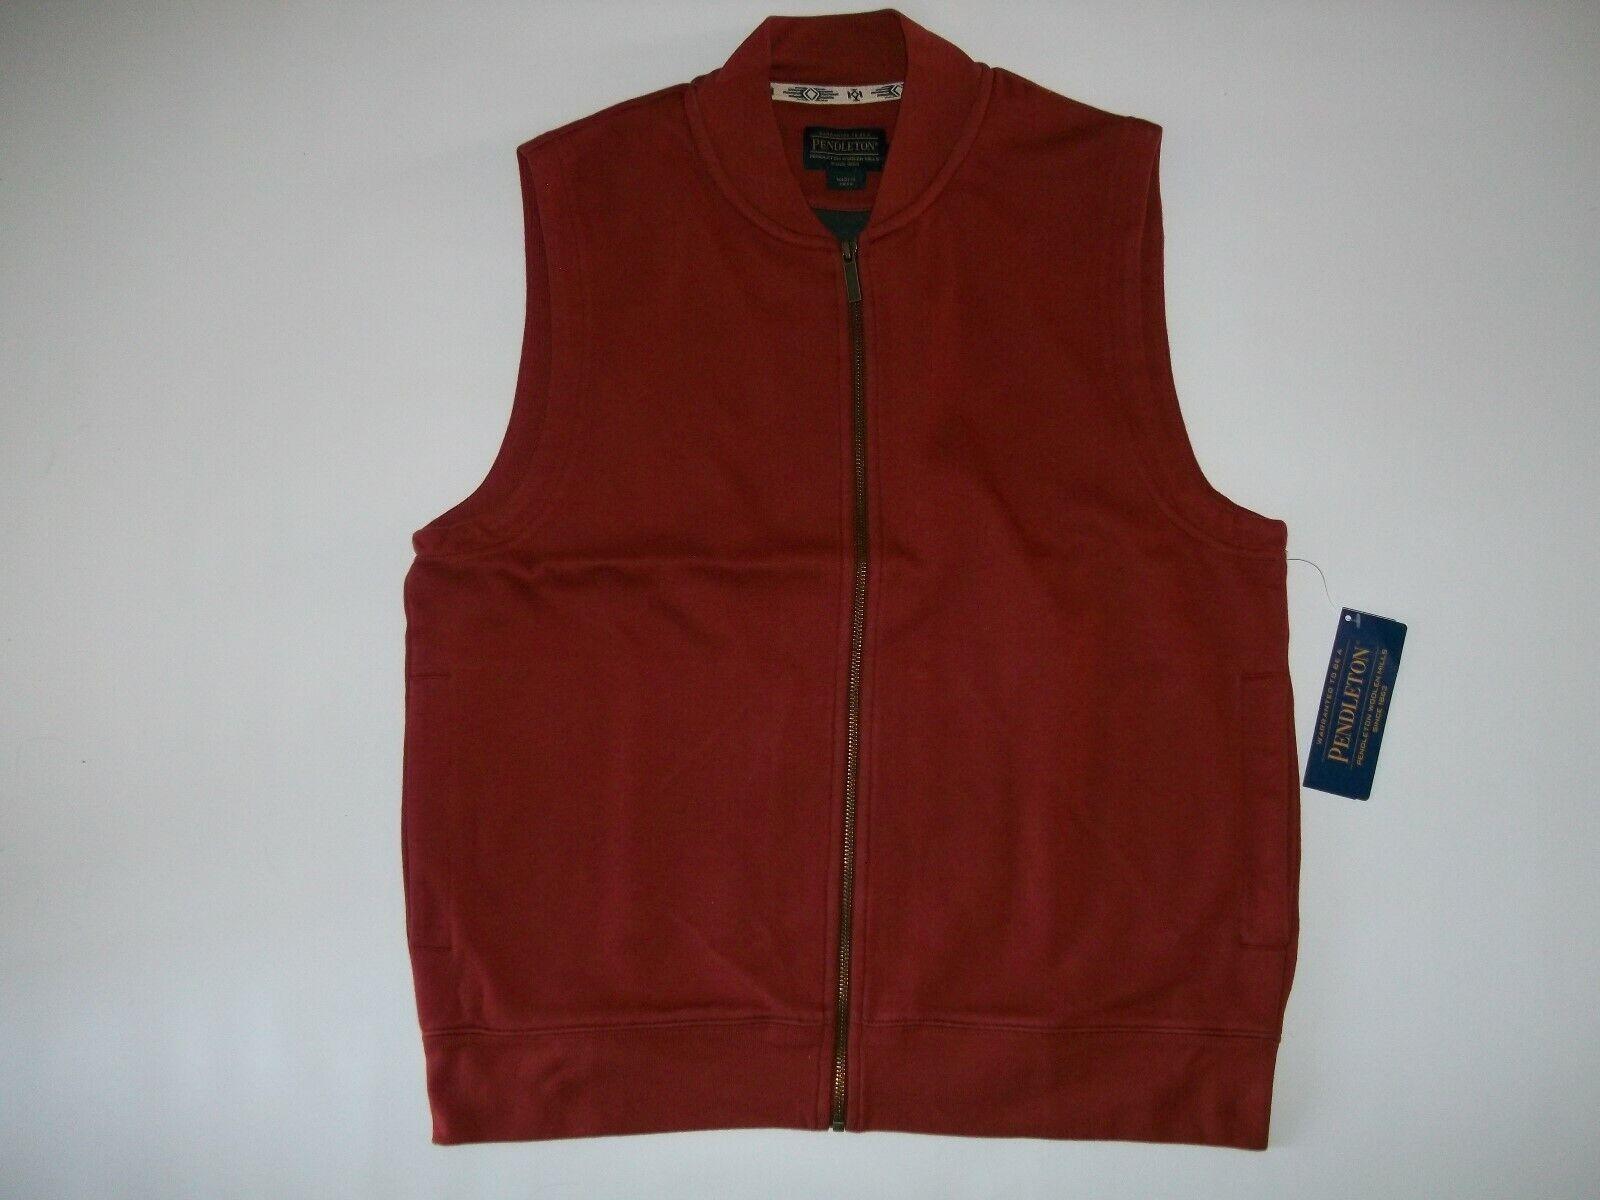 Pendleton Rost   Grau Alsea Fleecefutter Reißverschluss Top Jacke Herren Größe S